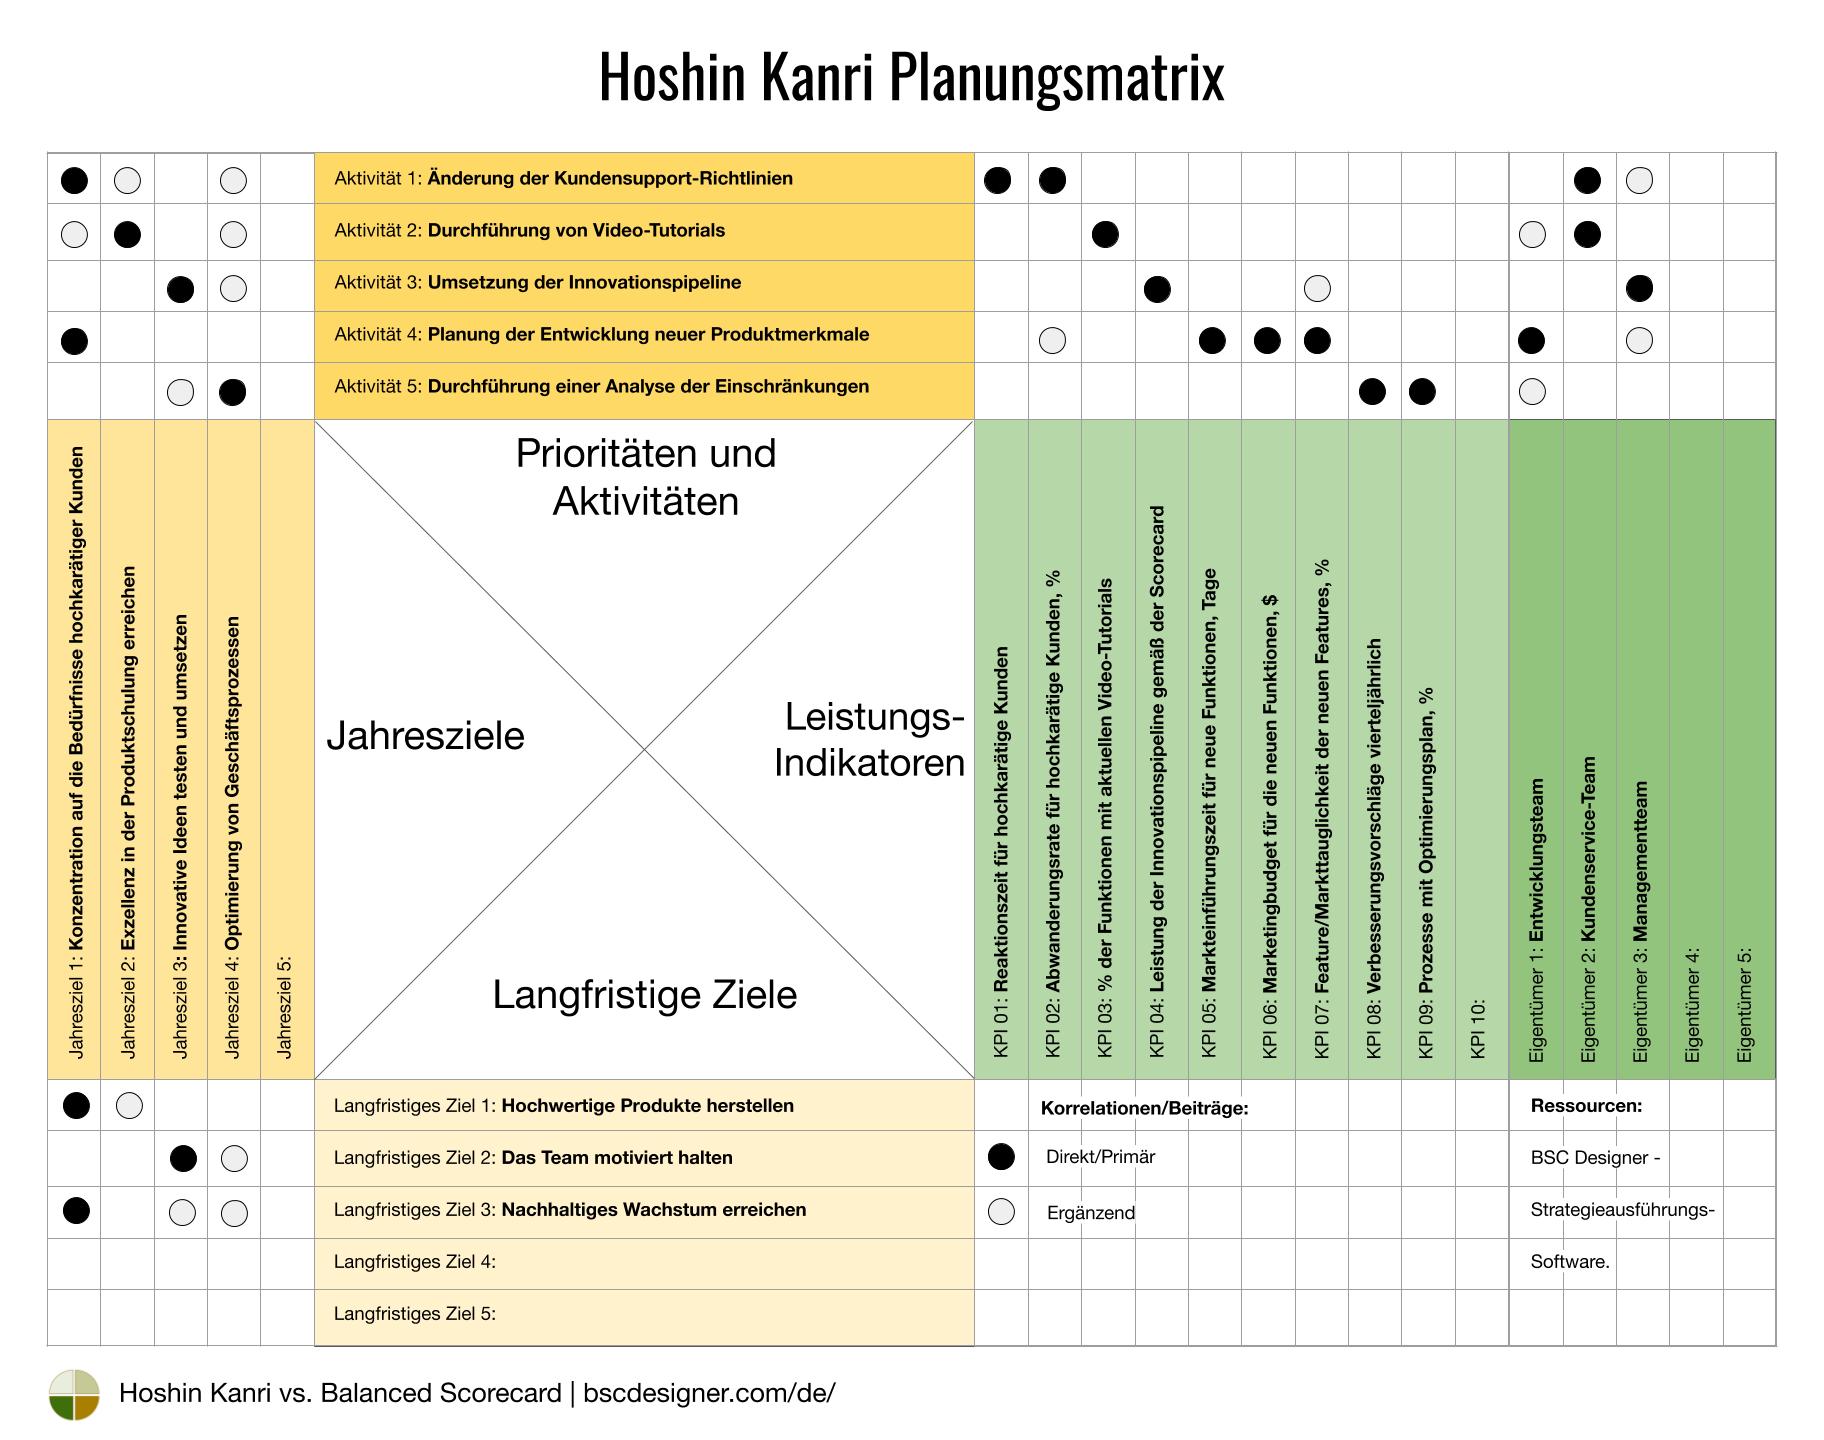 Hoshin Kanri Planungsmatrix